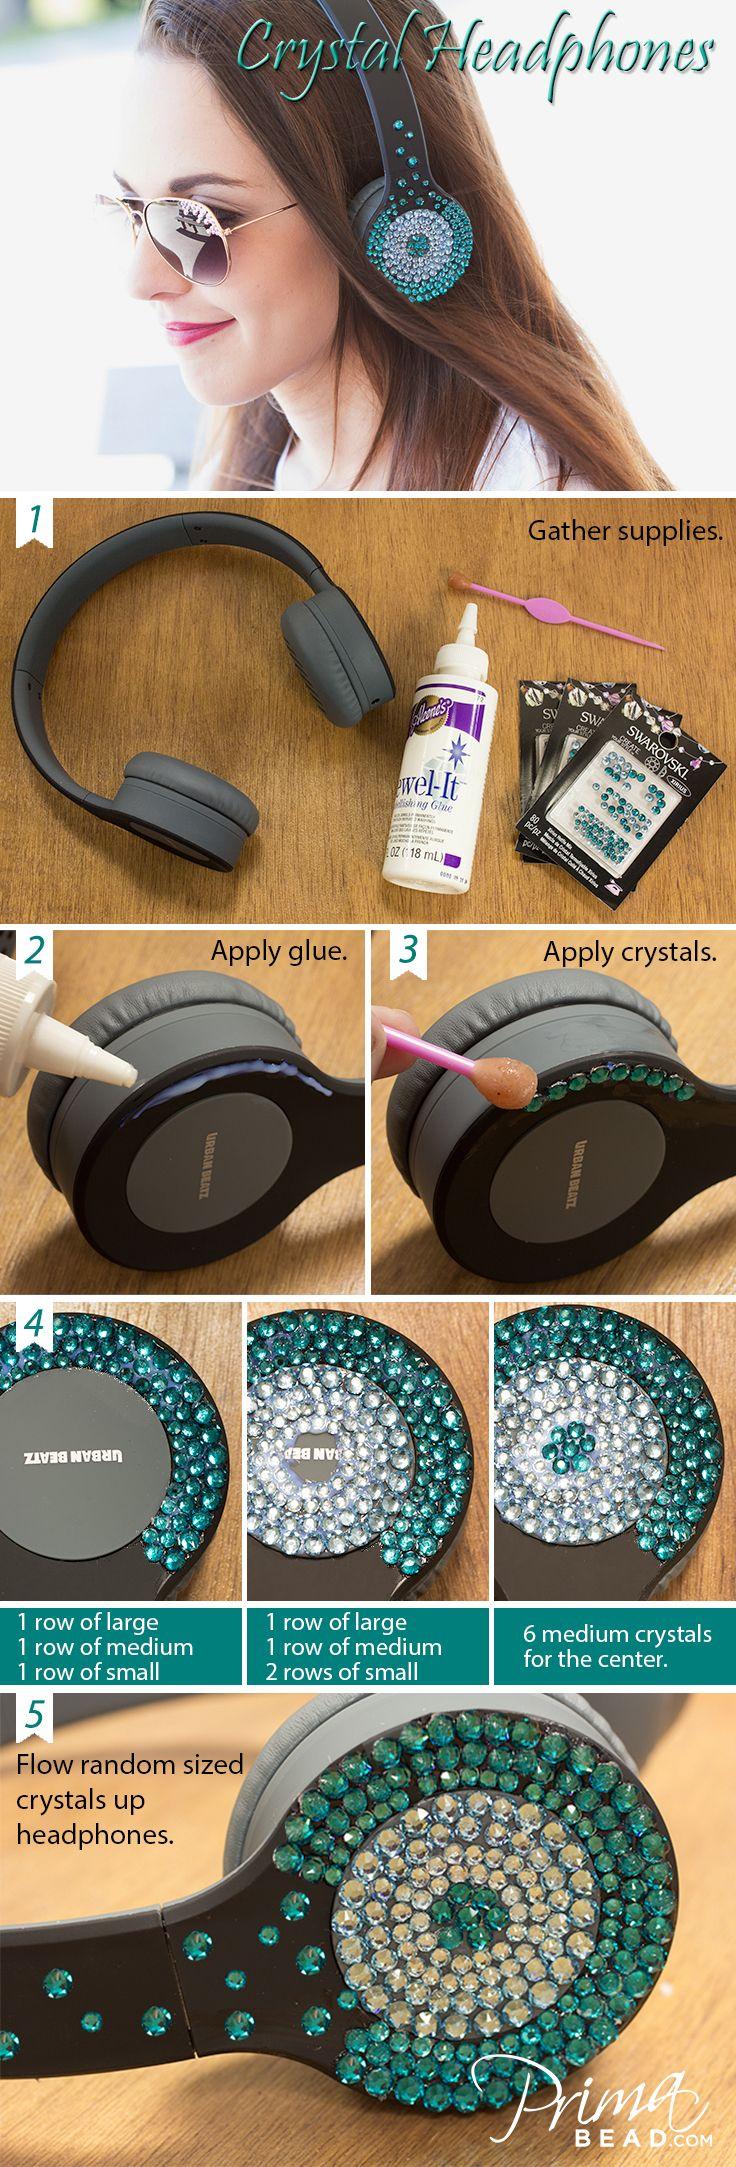 #Swarovski #headphones #bling #DIY #craft #bedazzle